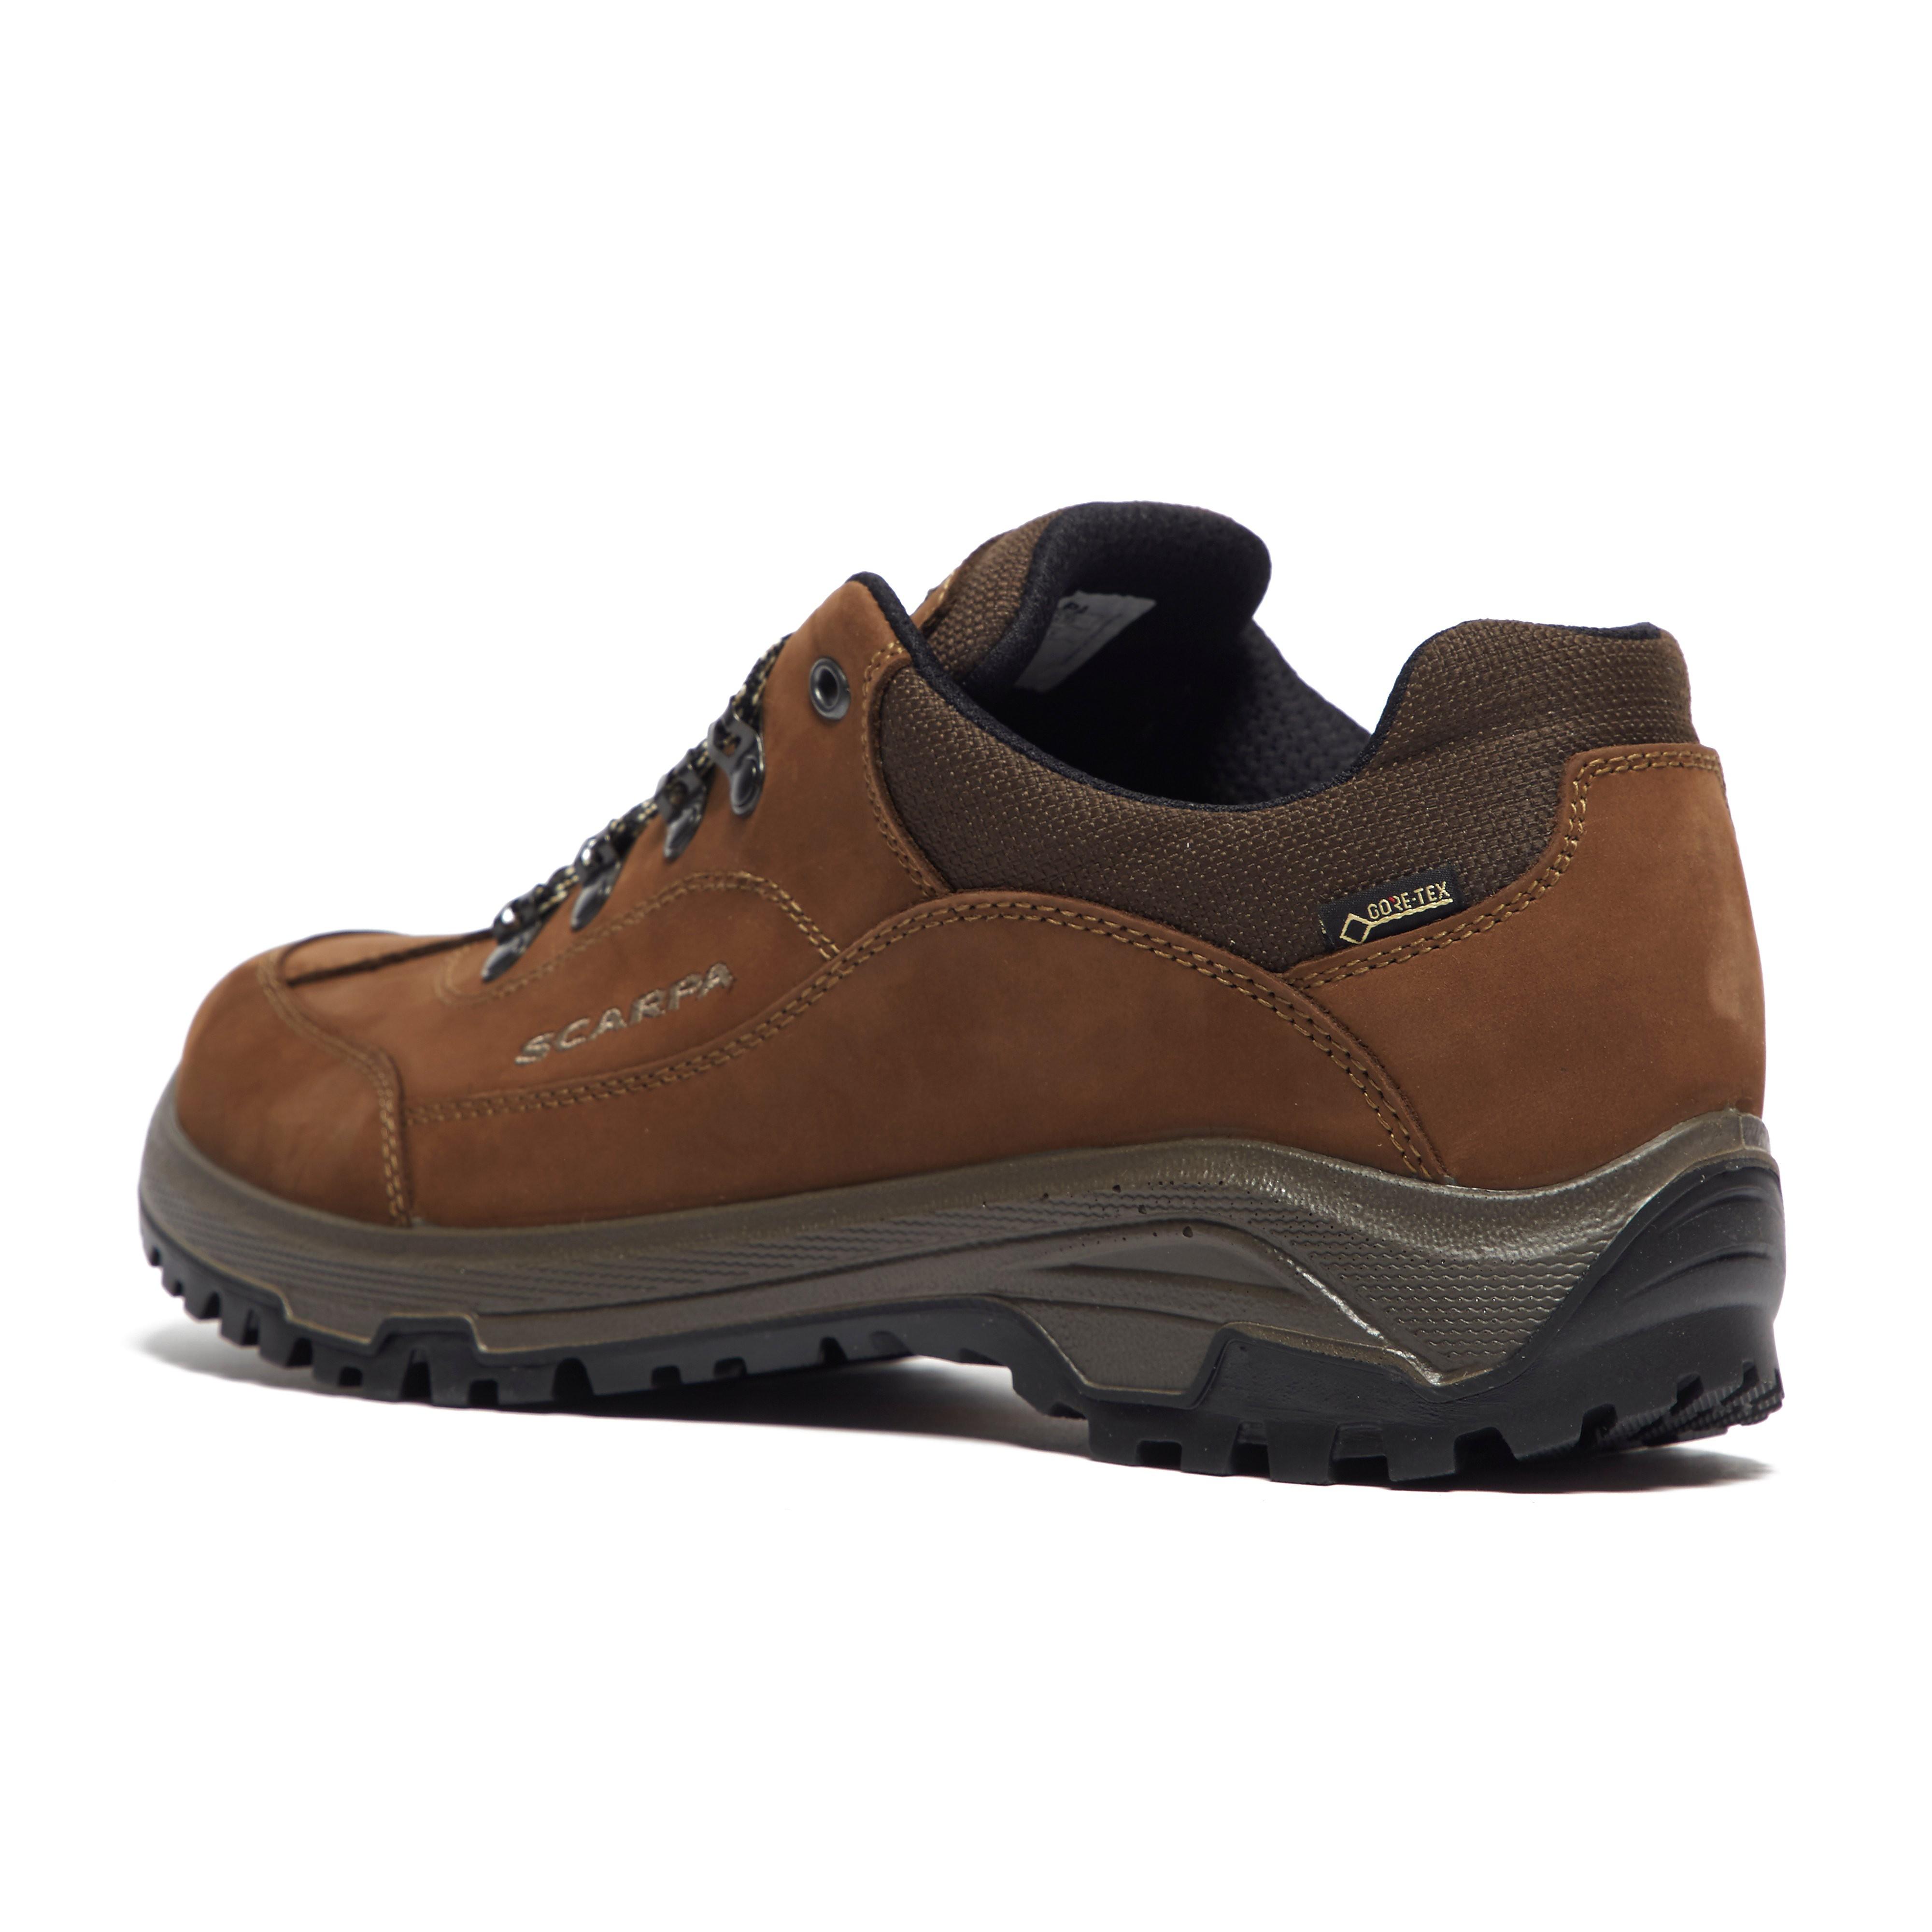 Scarpa Cyrus GTX Men's Trekking Shoe